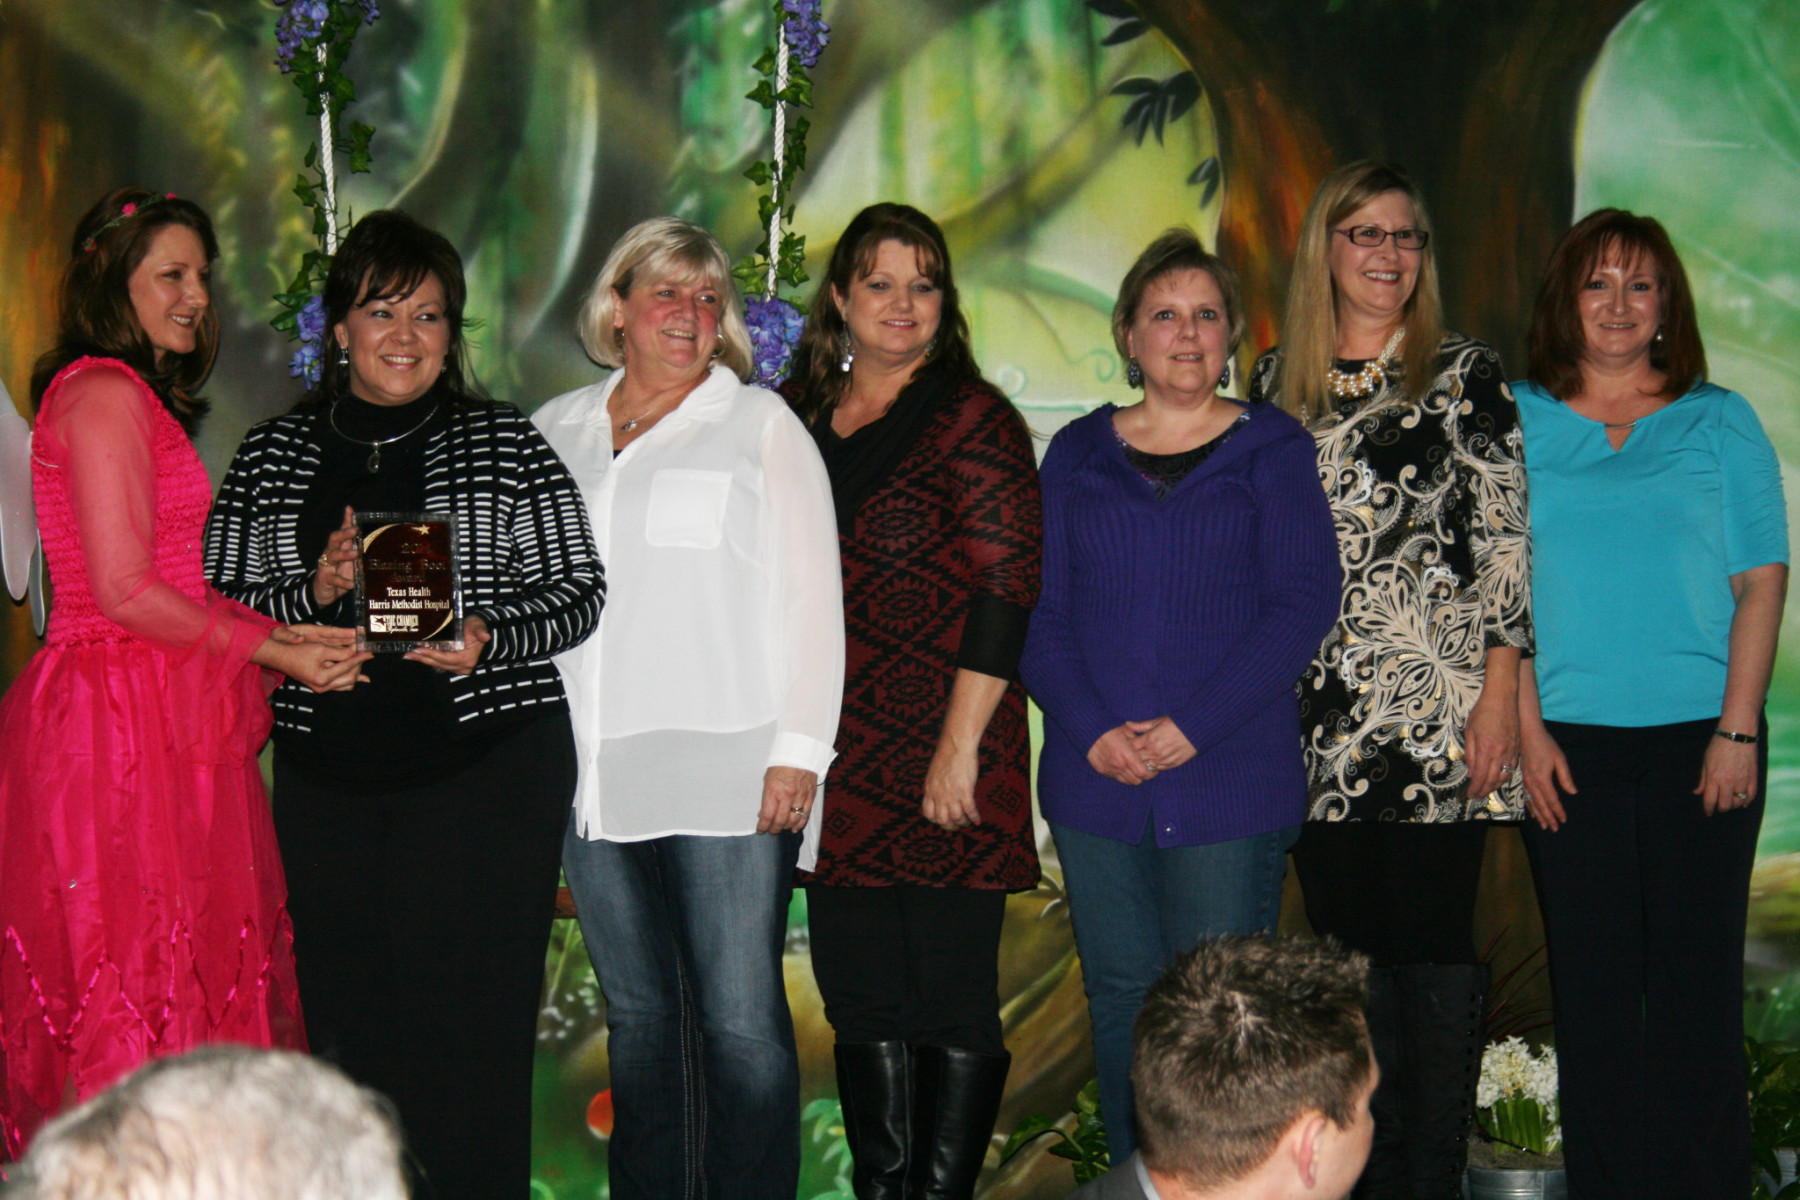 Blazing Boot Award winner - Texas Health Harris Methodist Hospital